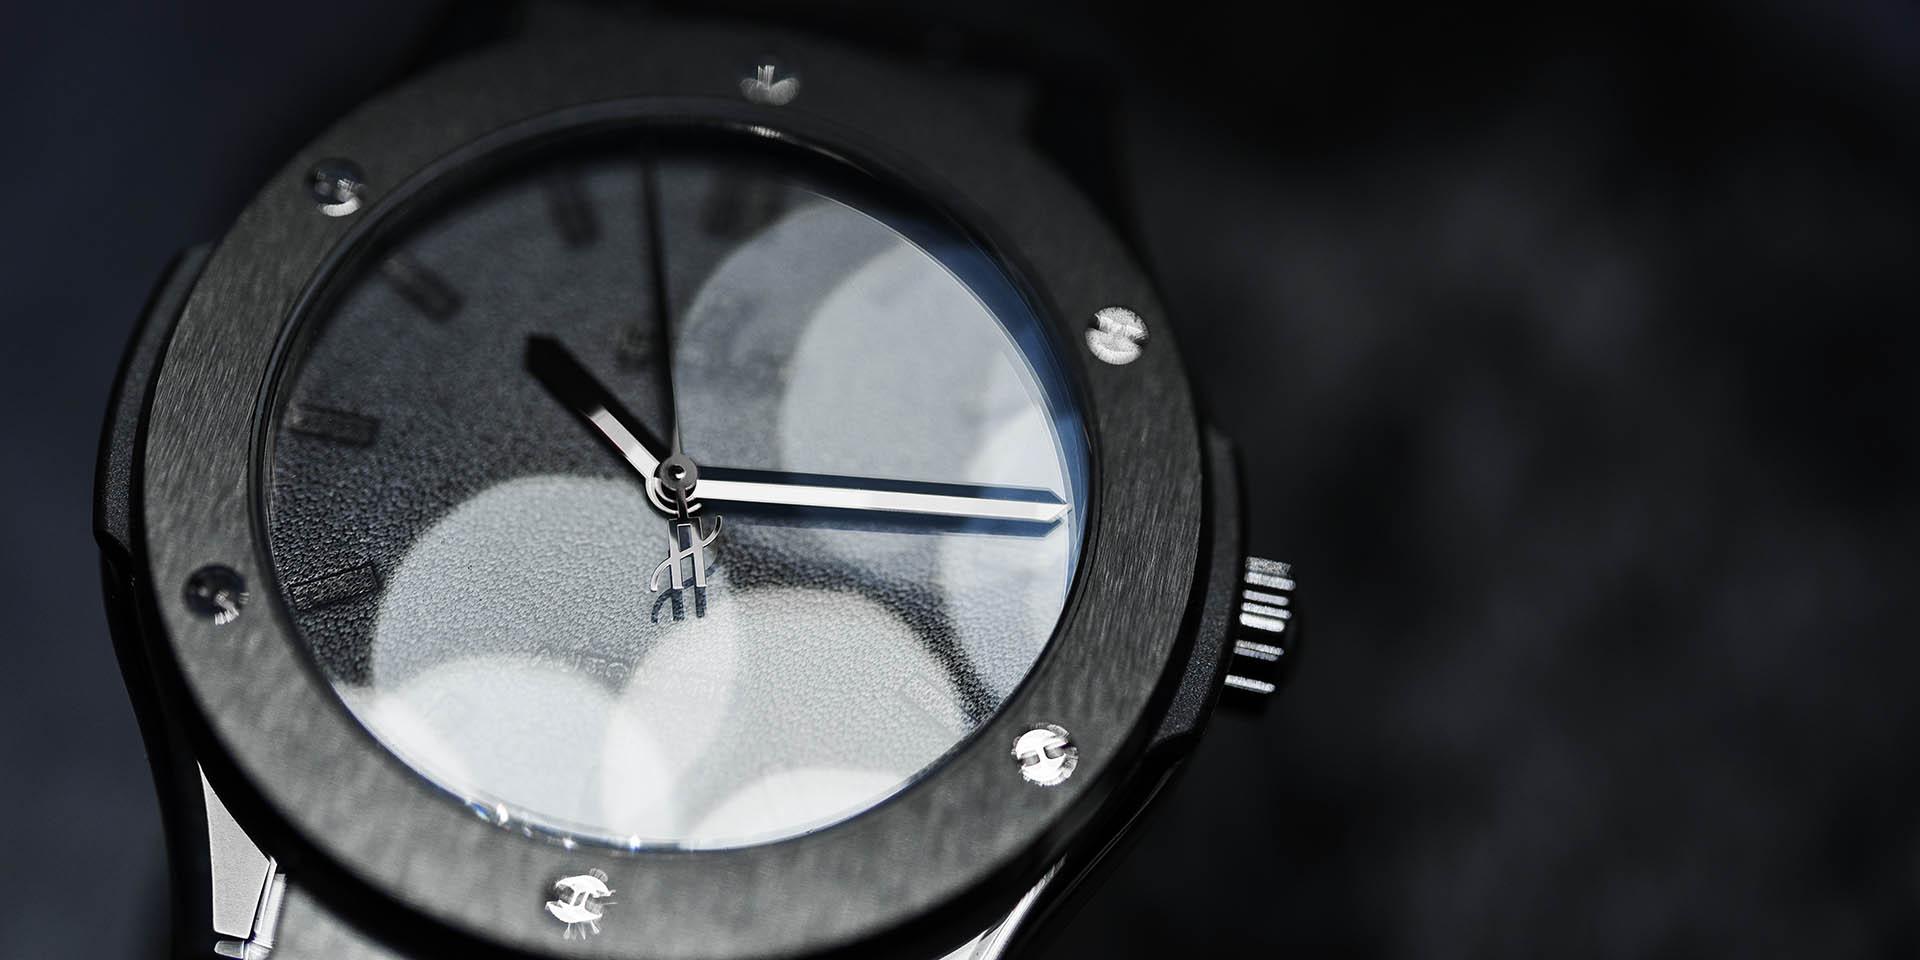 hublot-classic-fusion-berluti-all-black-9-.jpg